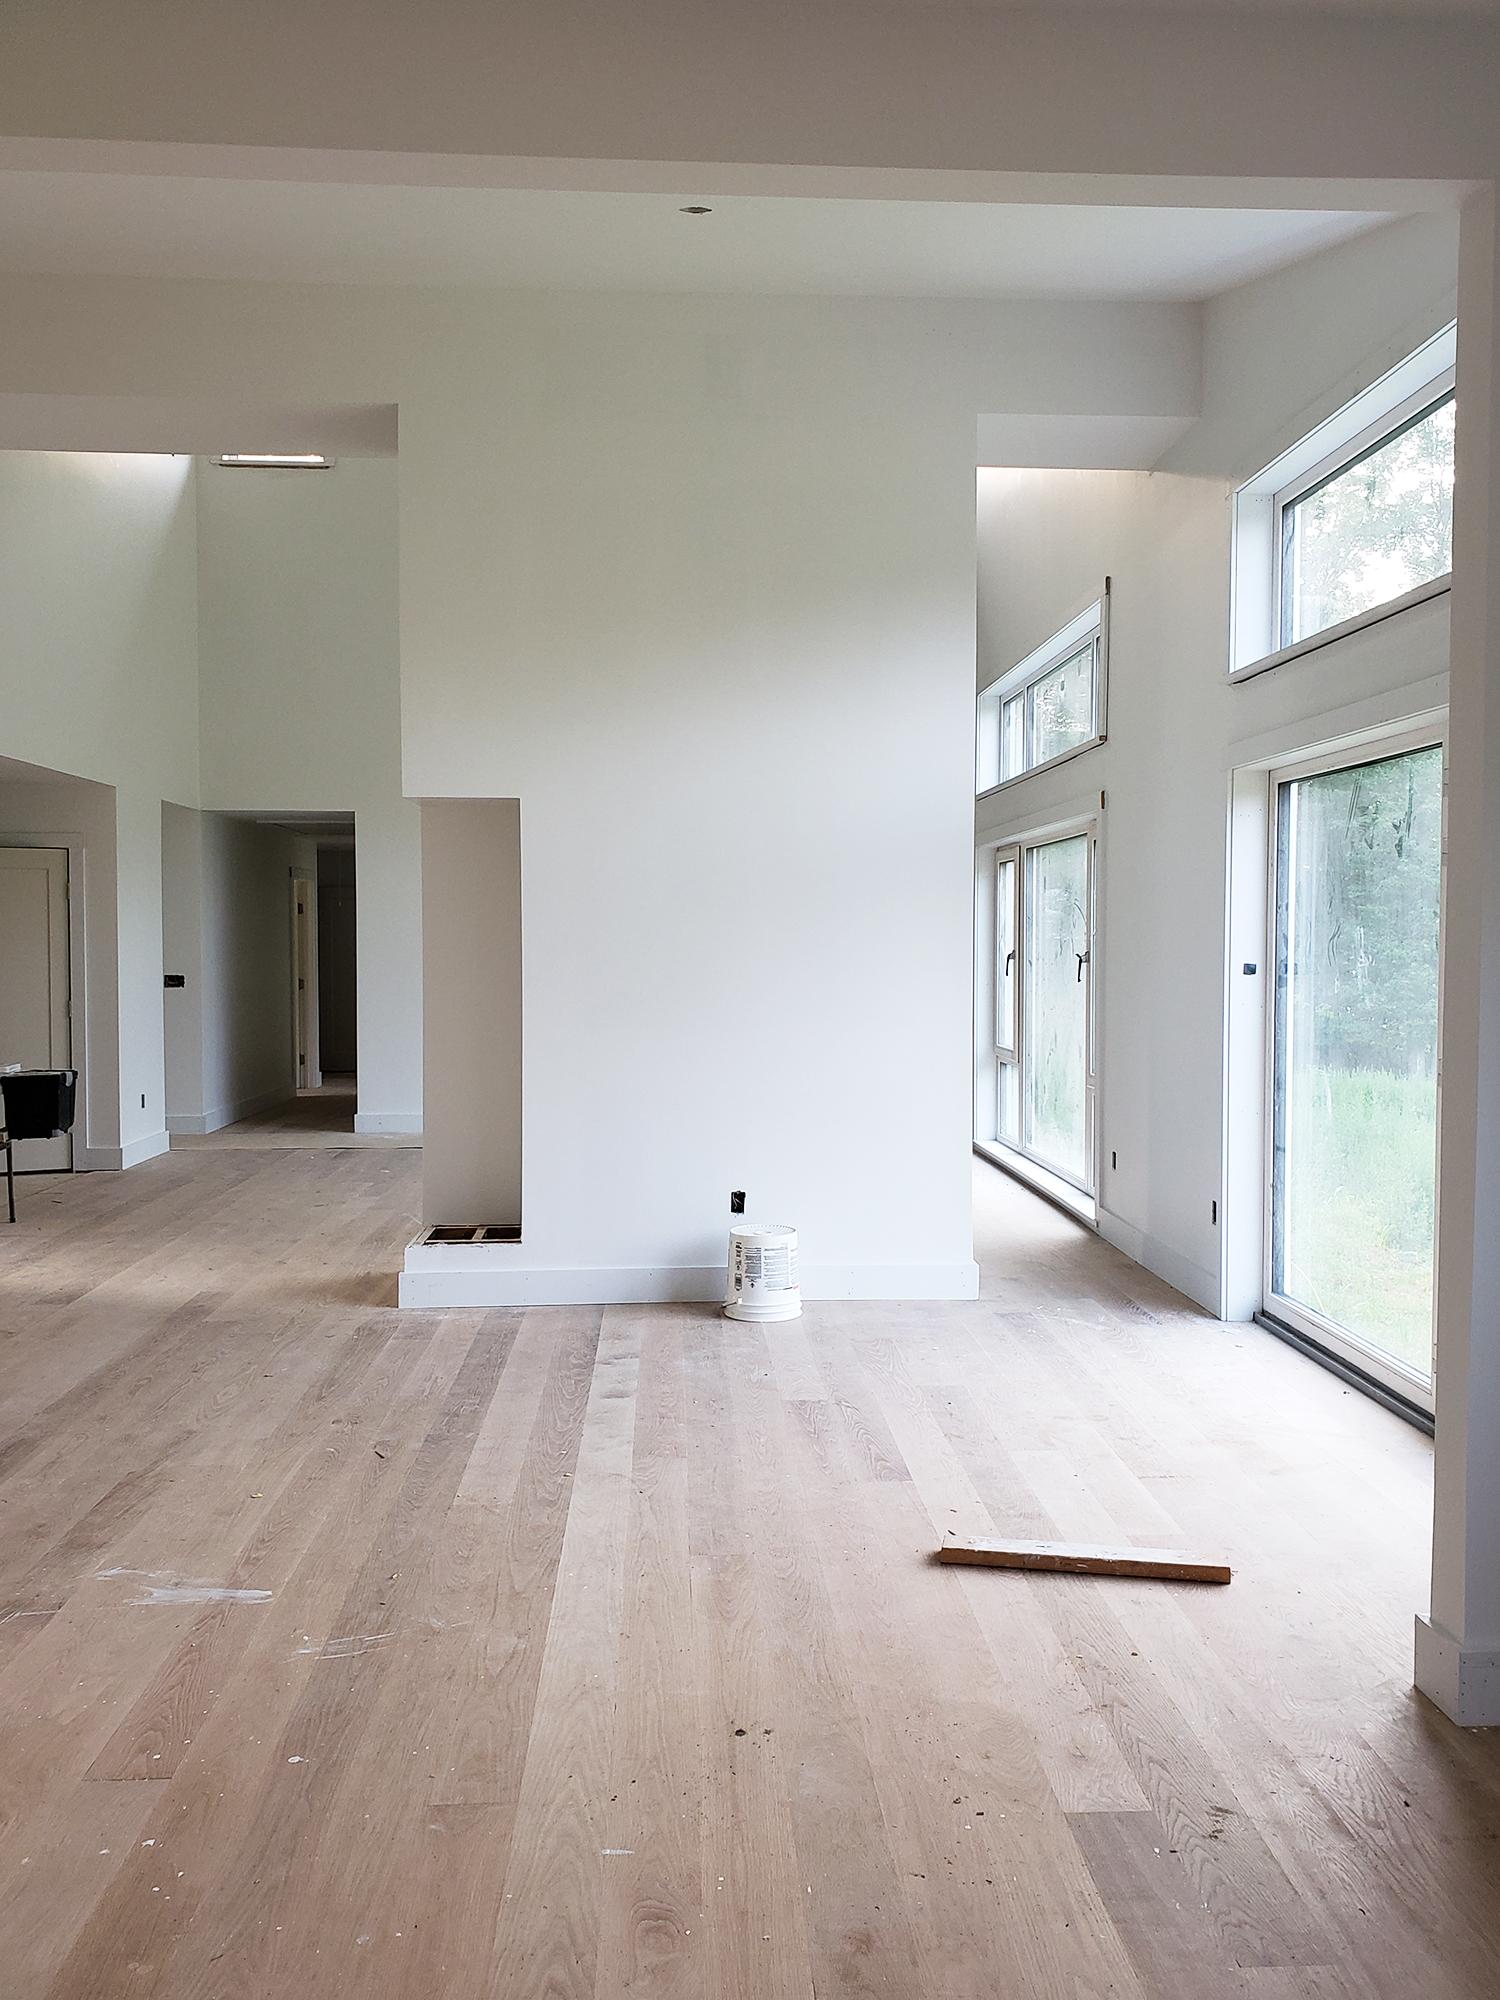 interior 11 resized.jpg